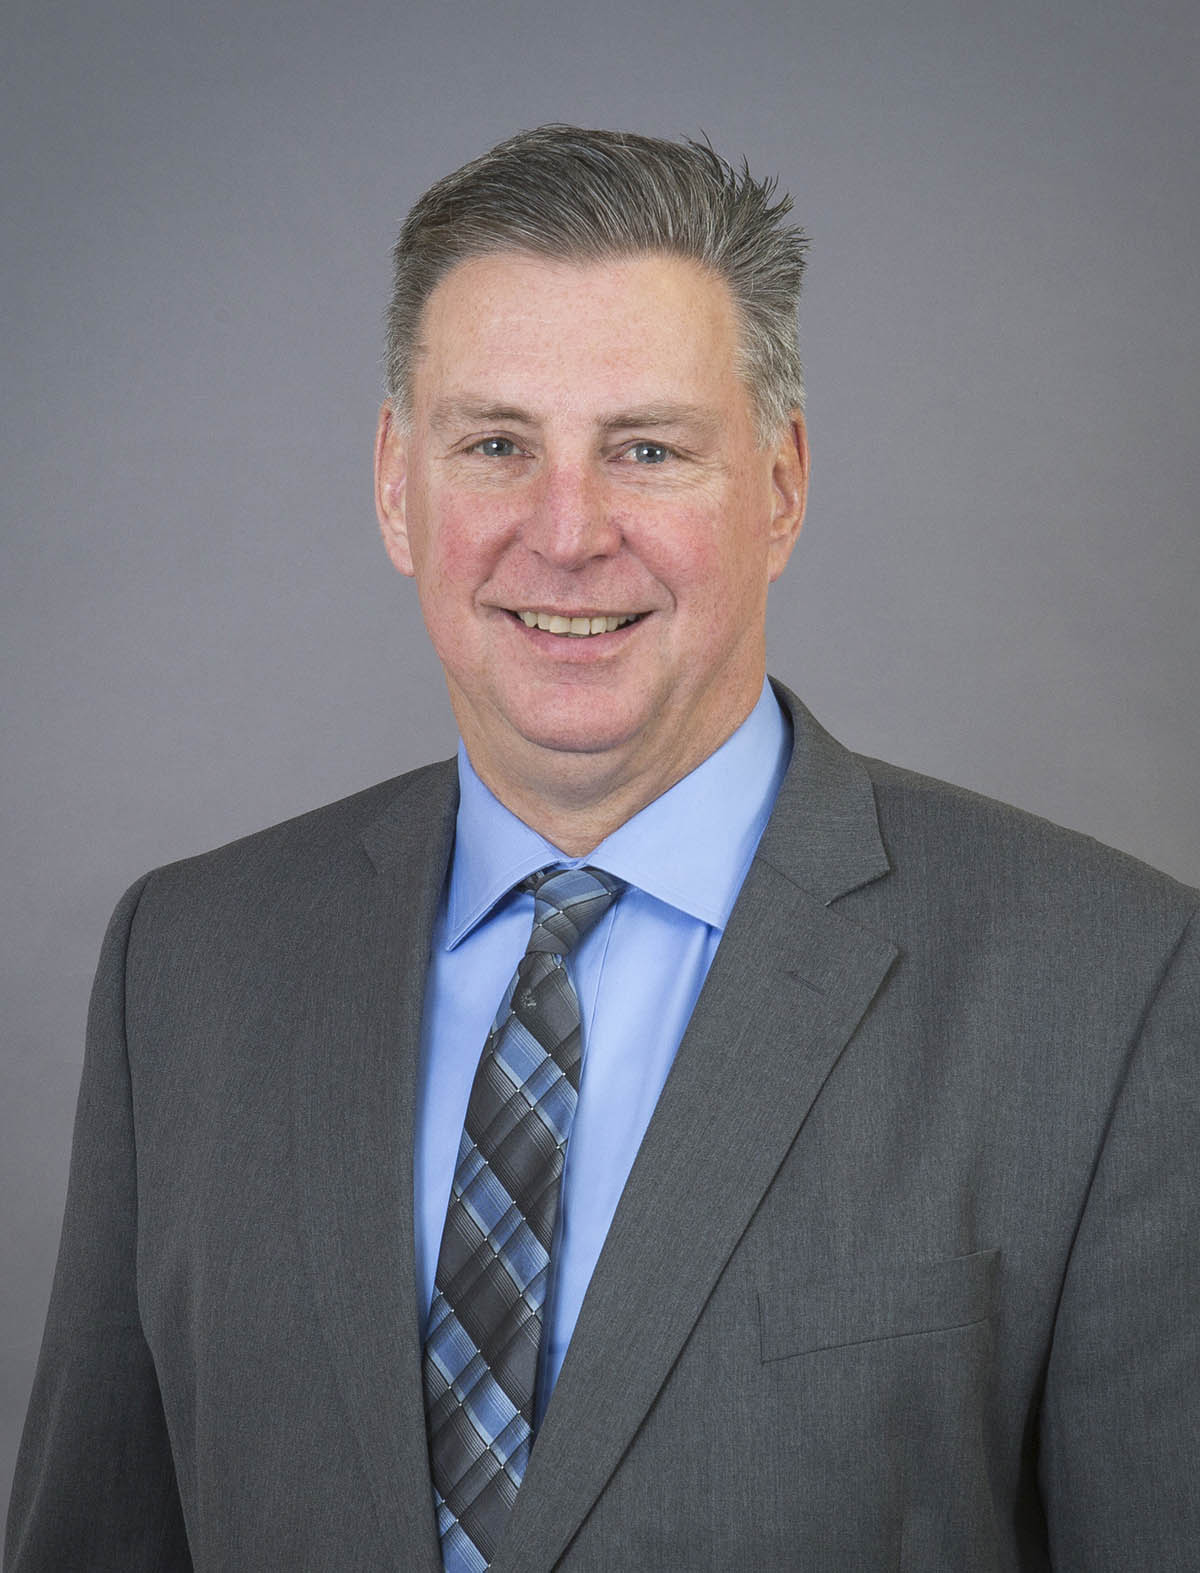 Monona Bank Business Banker Rich Cooper